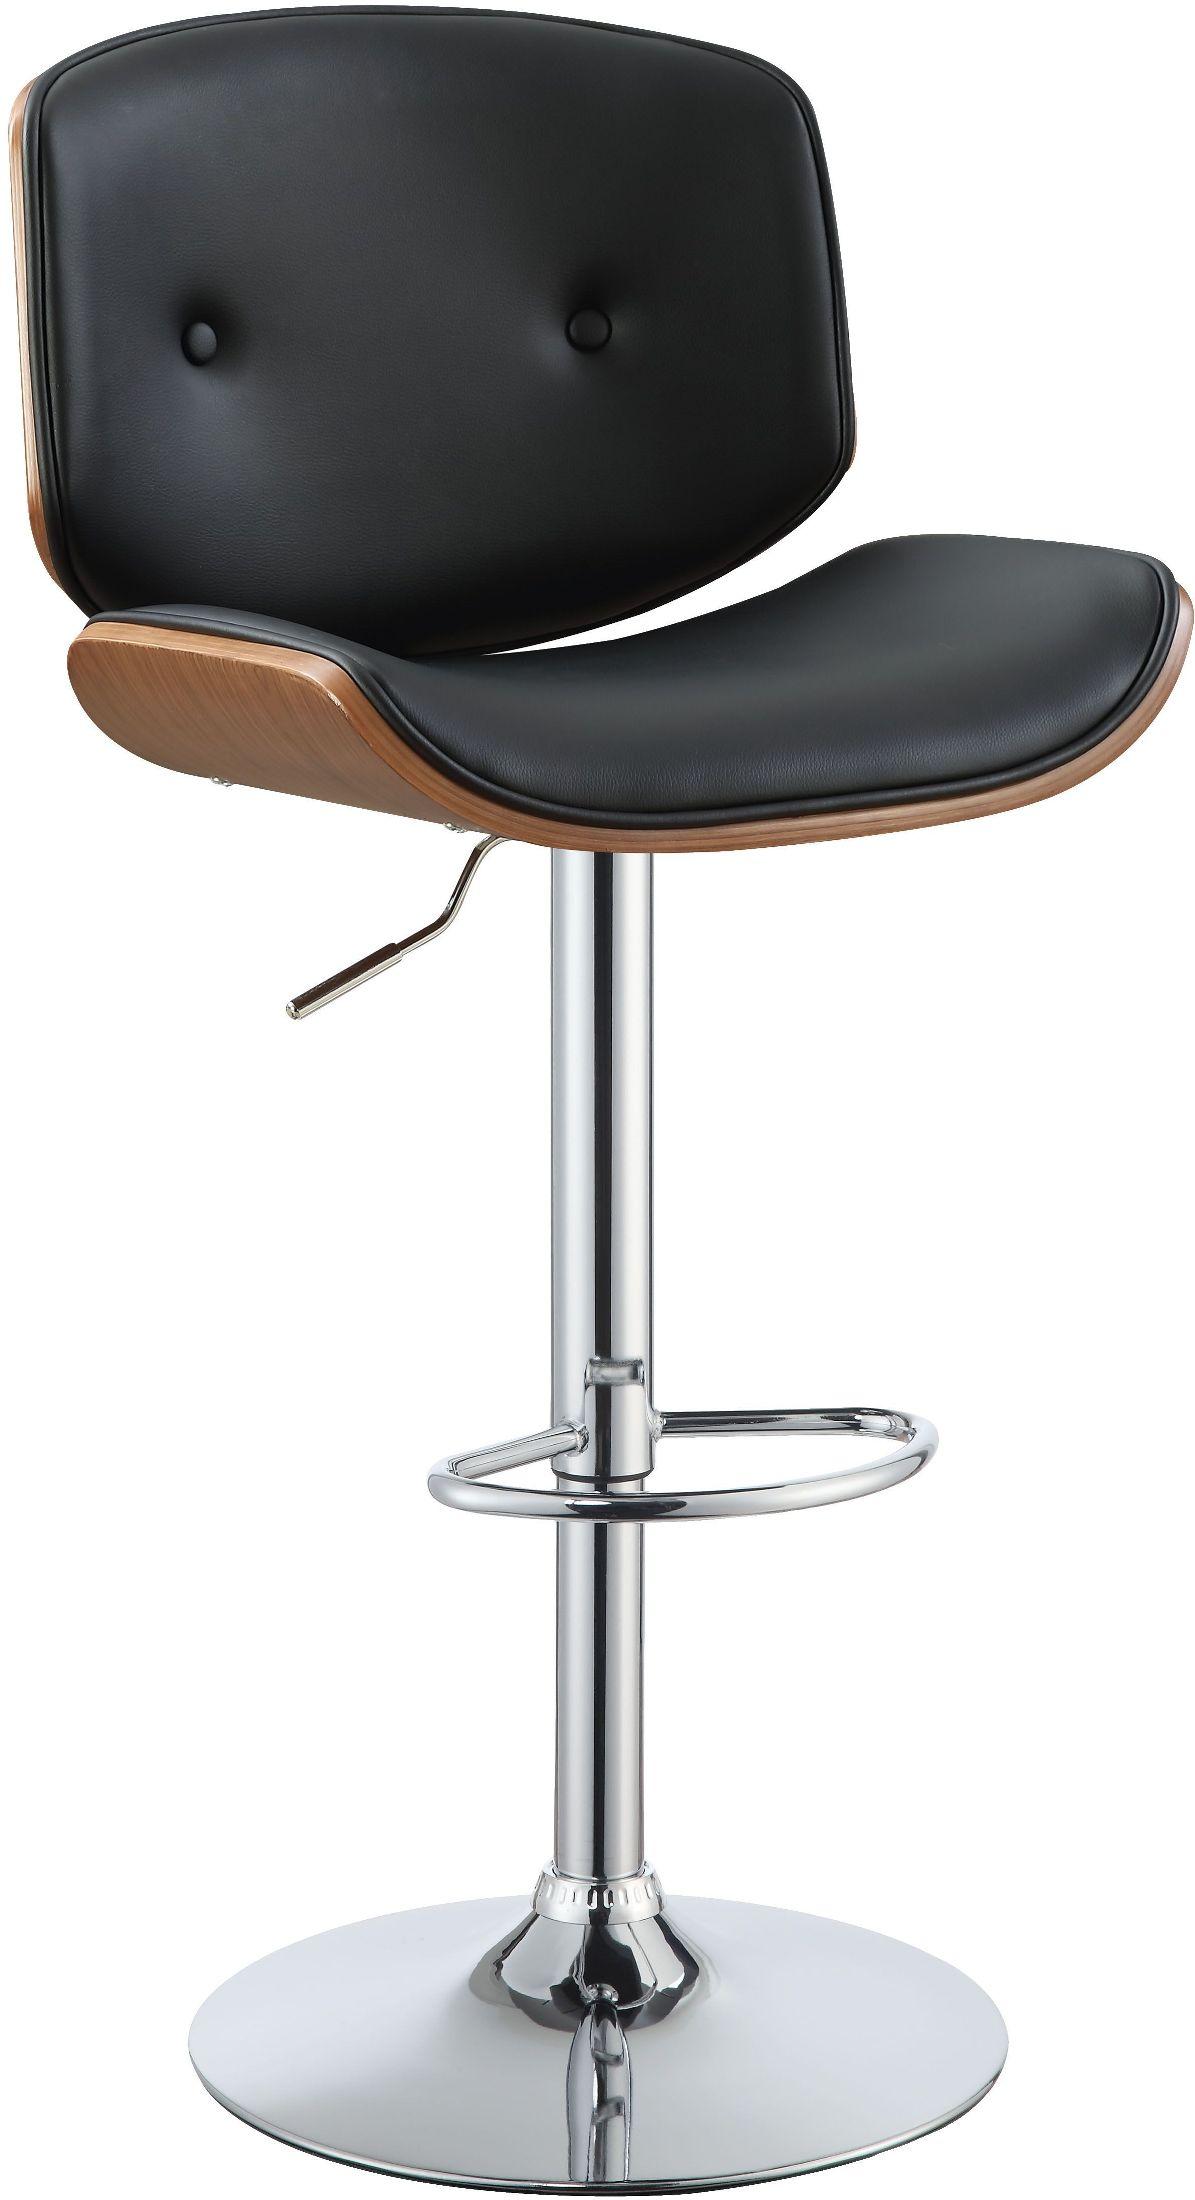 Acme Camila Black Upholstered Swivel Adjustable Stool